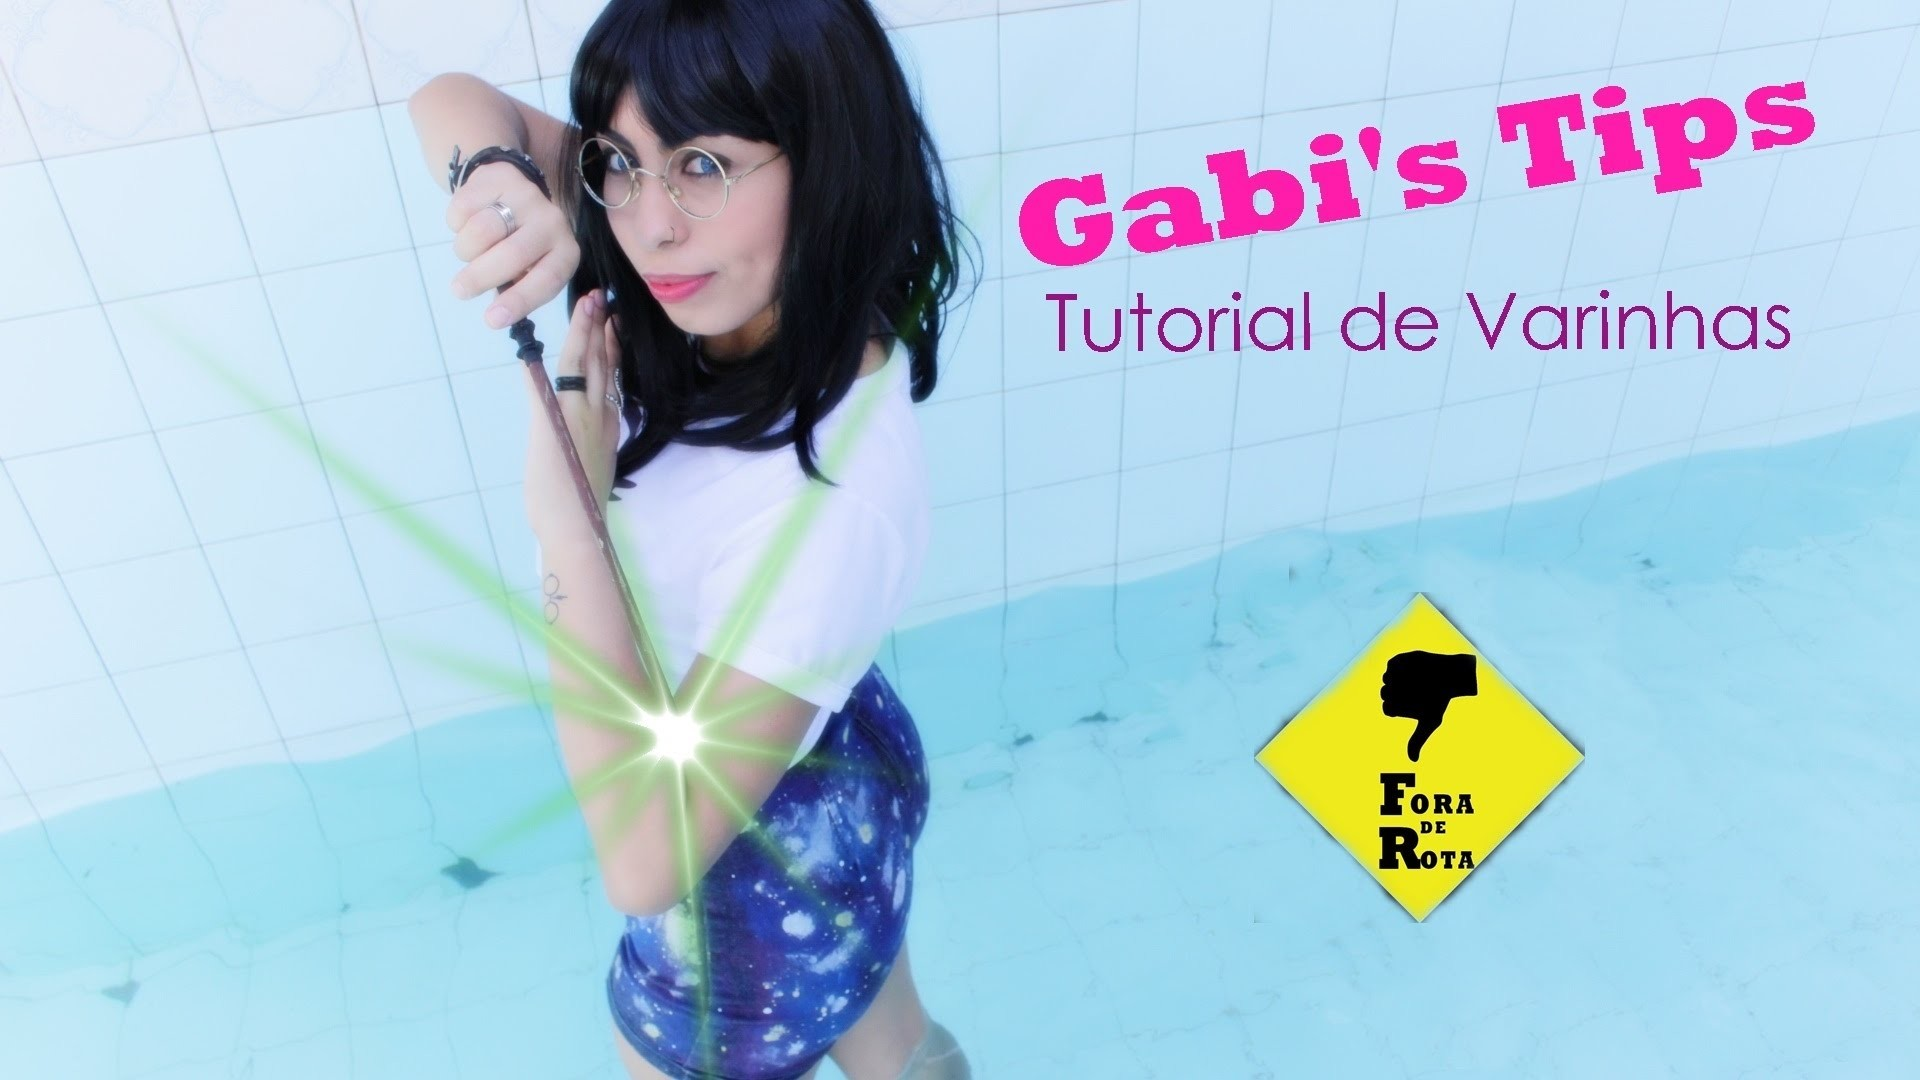 Gabi's Tips - DIY - Tutorial de Varinhas